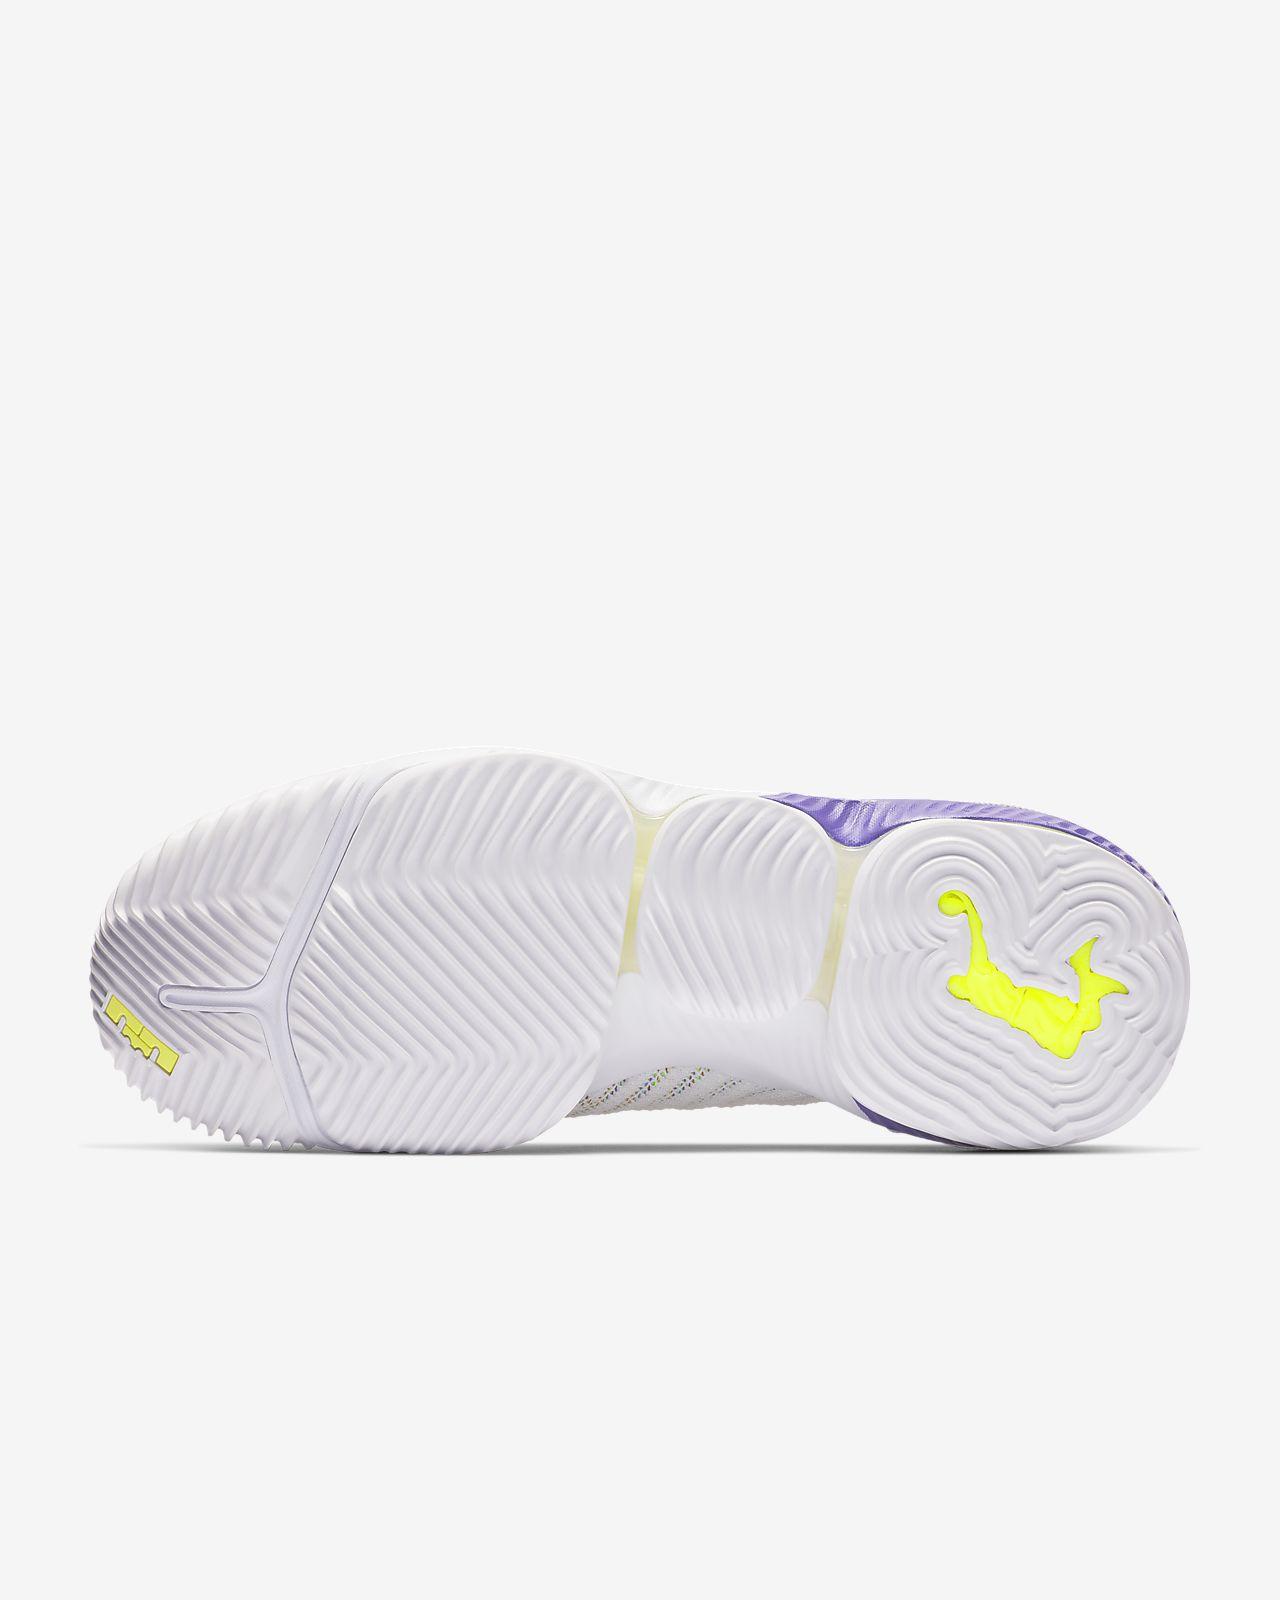 9105060987a2 Low Resolution LeBron 16 Basketball Shoe LeBron 16 Basketball Shoe